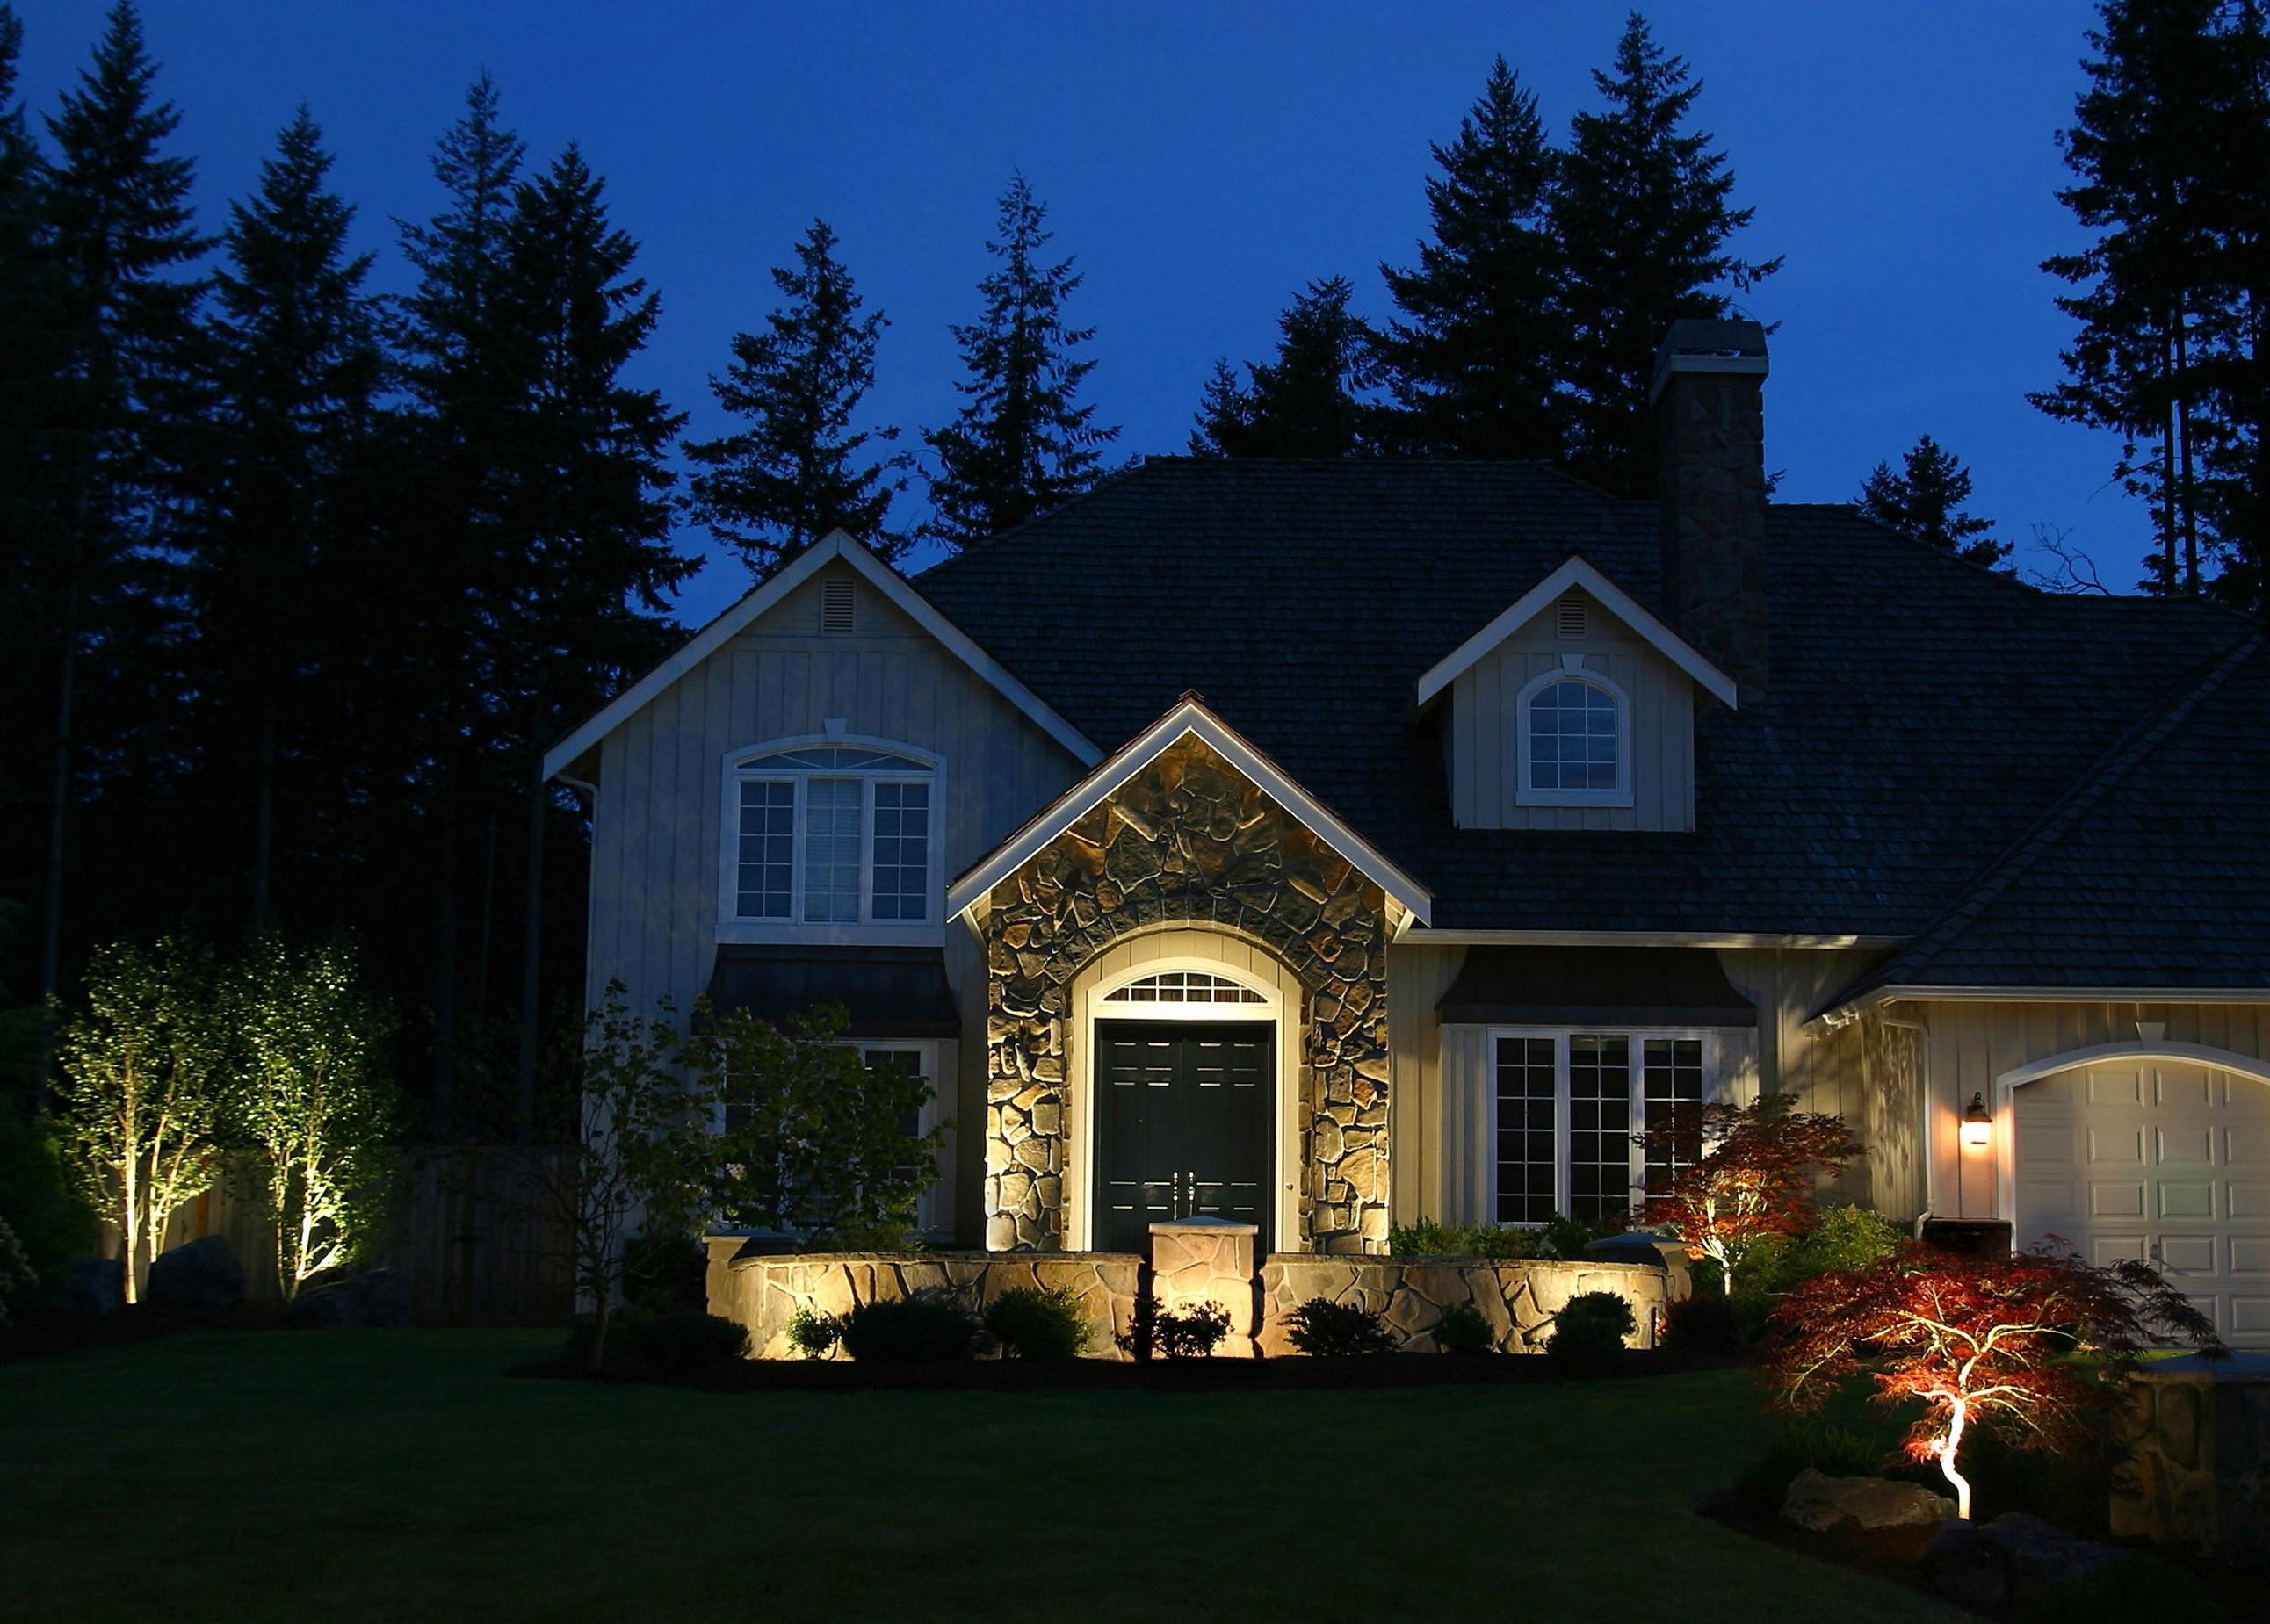 Outdoor Landscape Lanterns For Fashionable Landscape Lighting Tips Diy Hanging Lanterns Backyard Ideas For A (View 12 of 20)